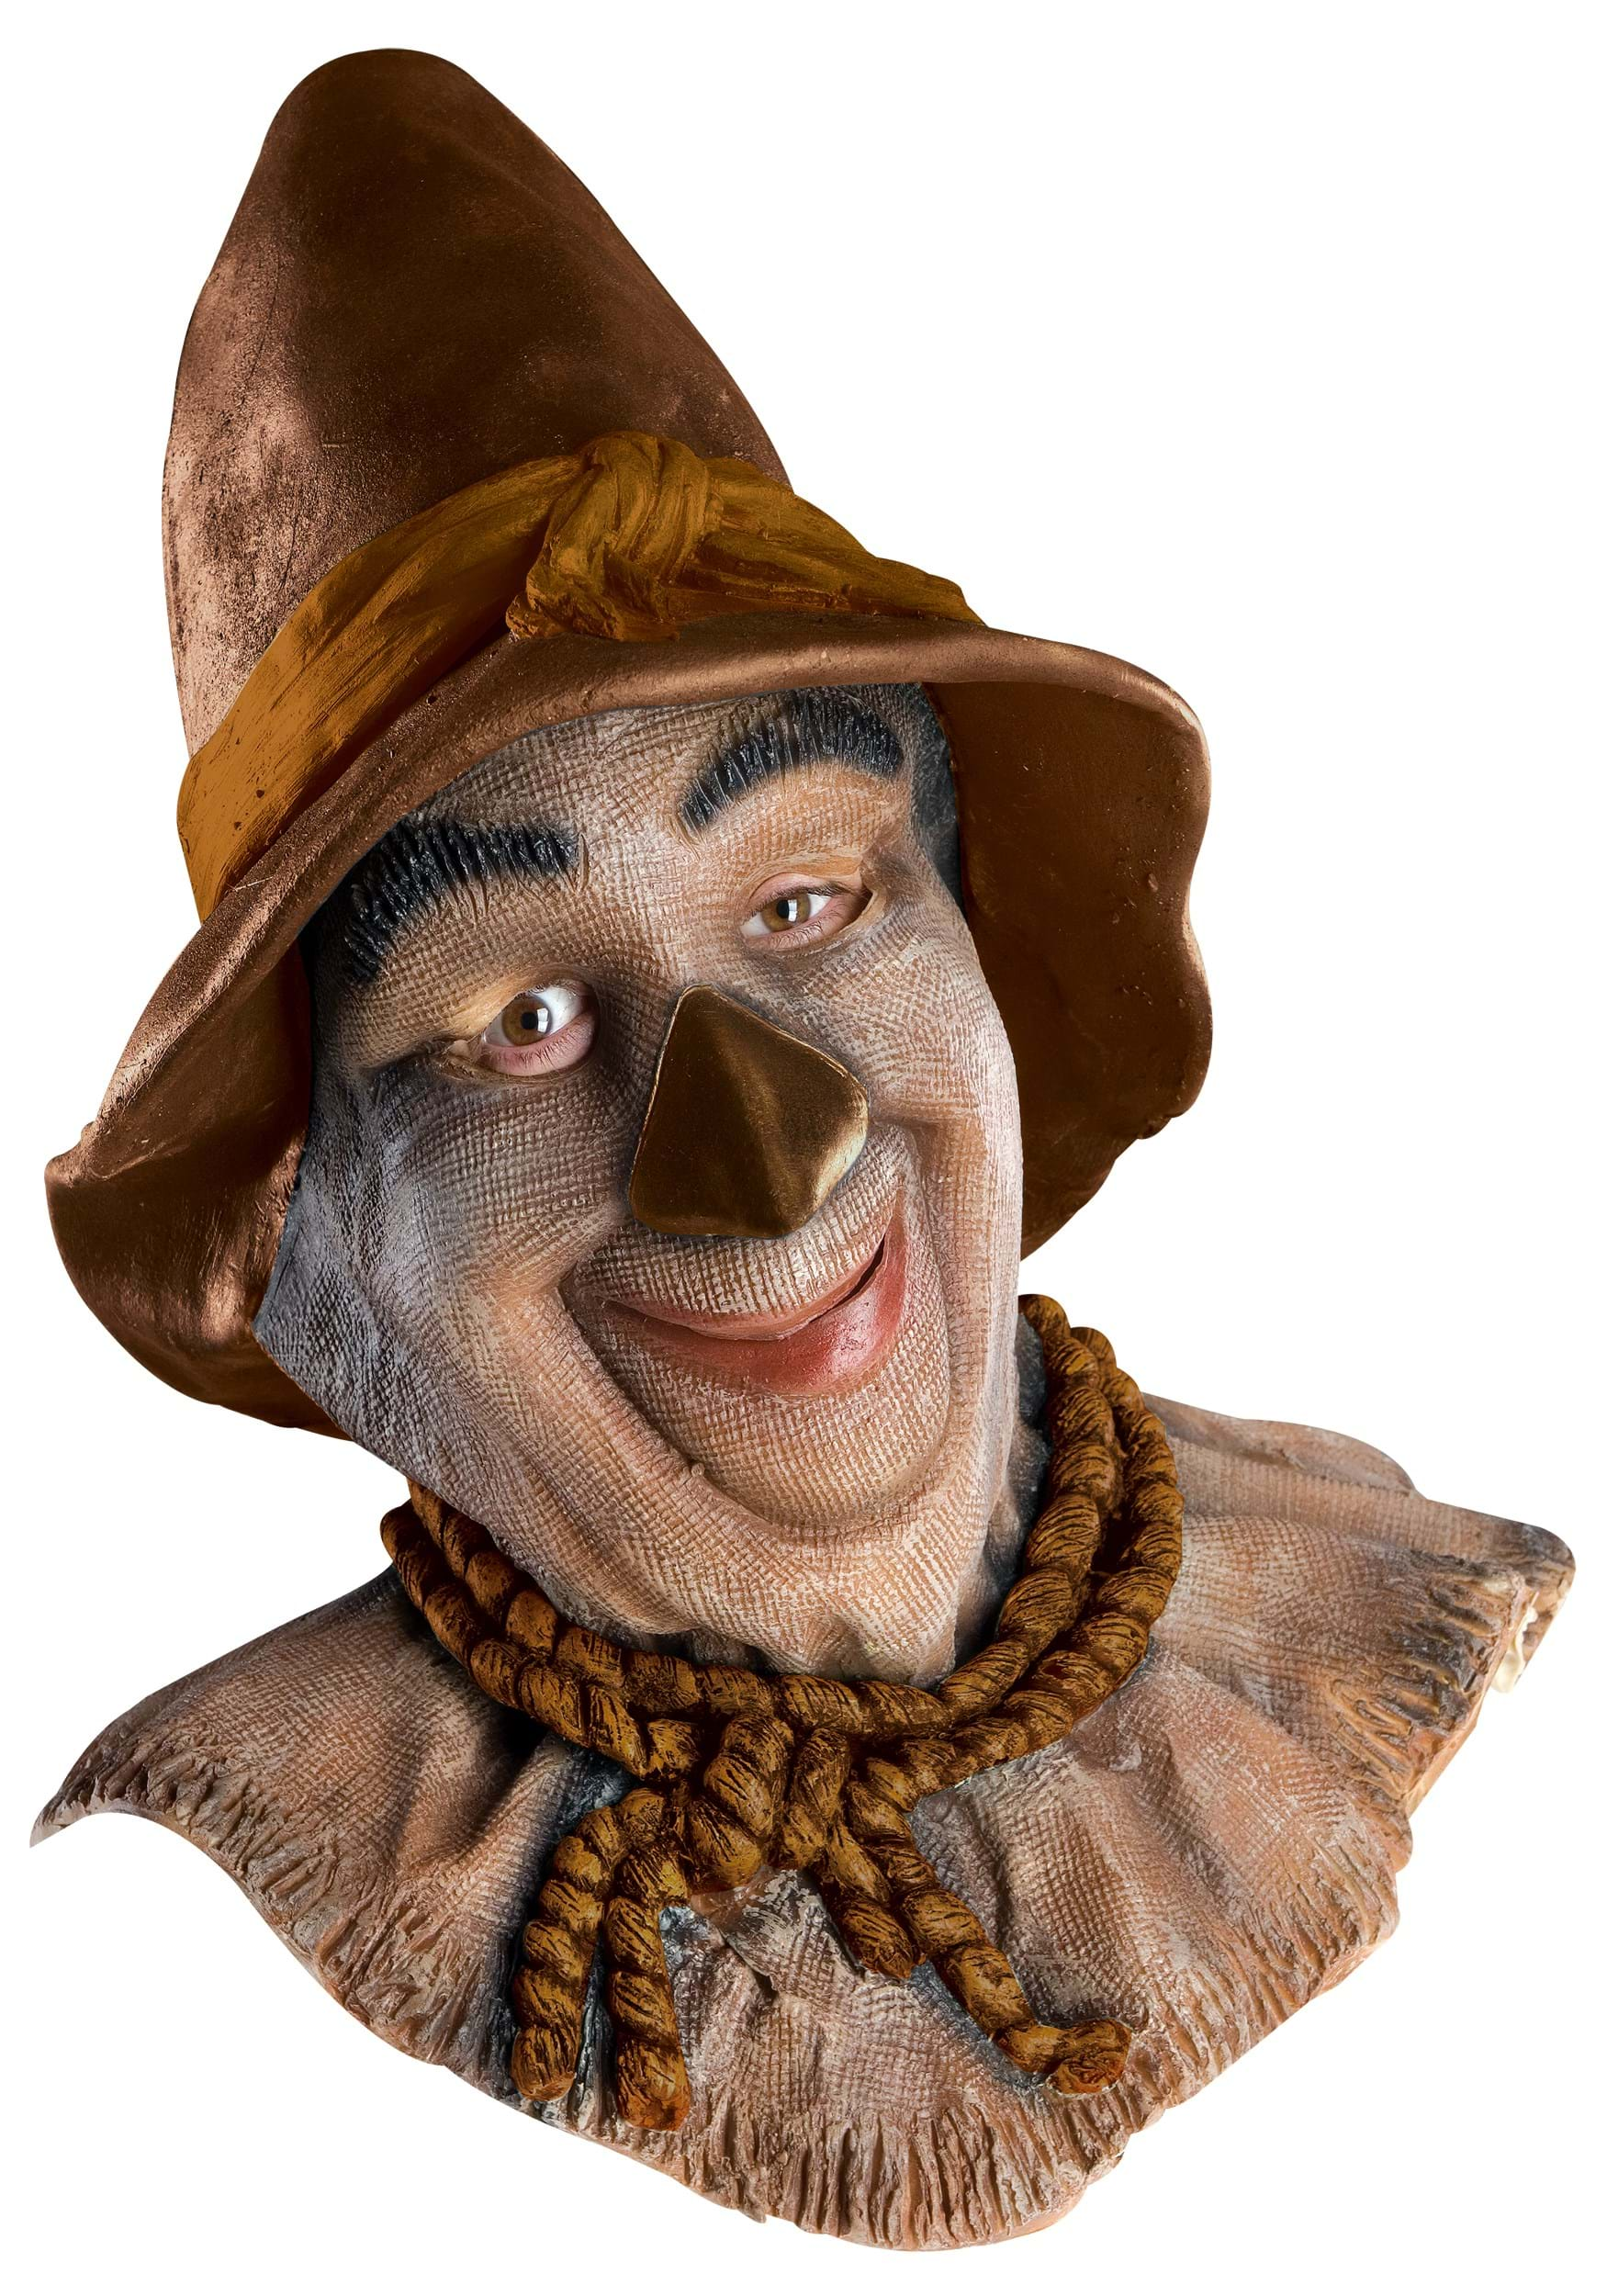 Scarecrow Costumes - Wizard of Oz Scarecrow Costume